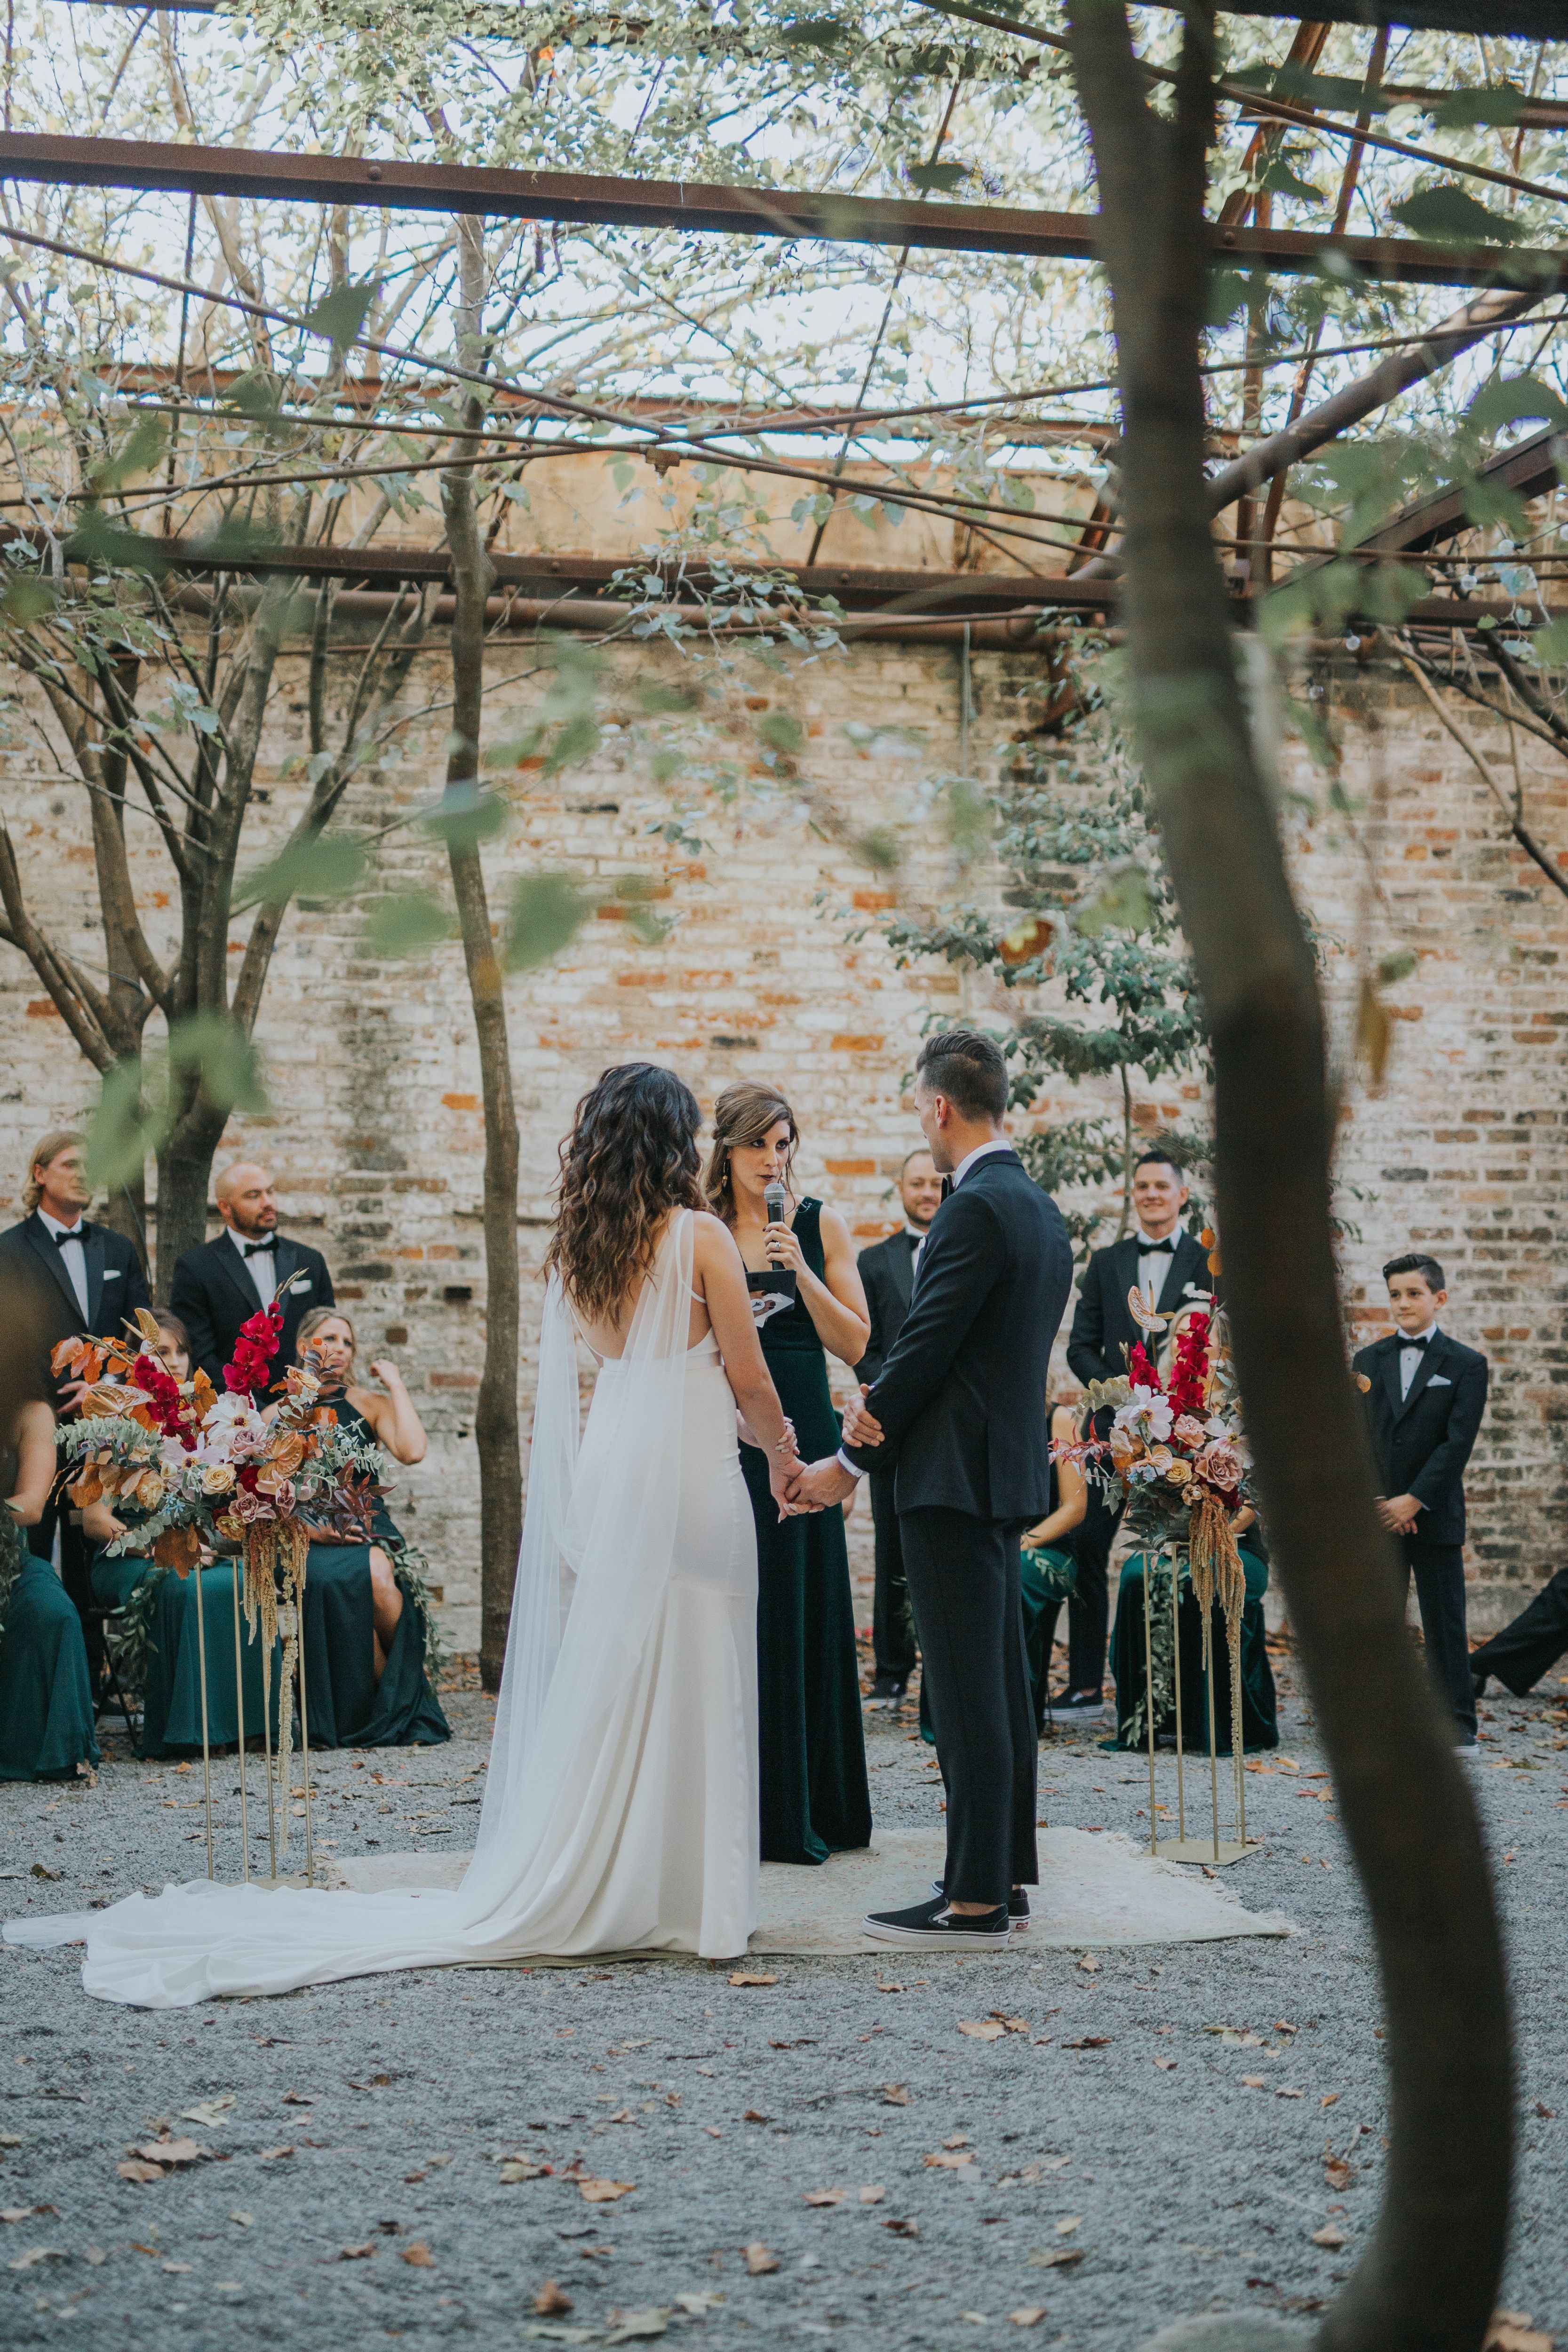 Arts Estuary Ceremony In New Orleans W Lovegood Wedding Event Rentals In 2020 Event Rental Wedding Events Wedding